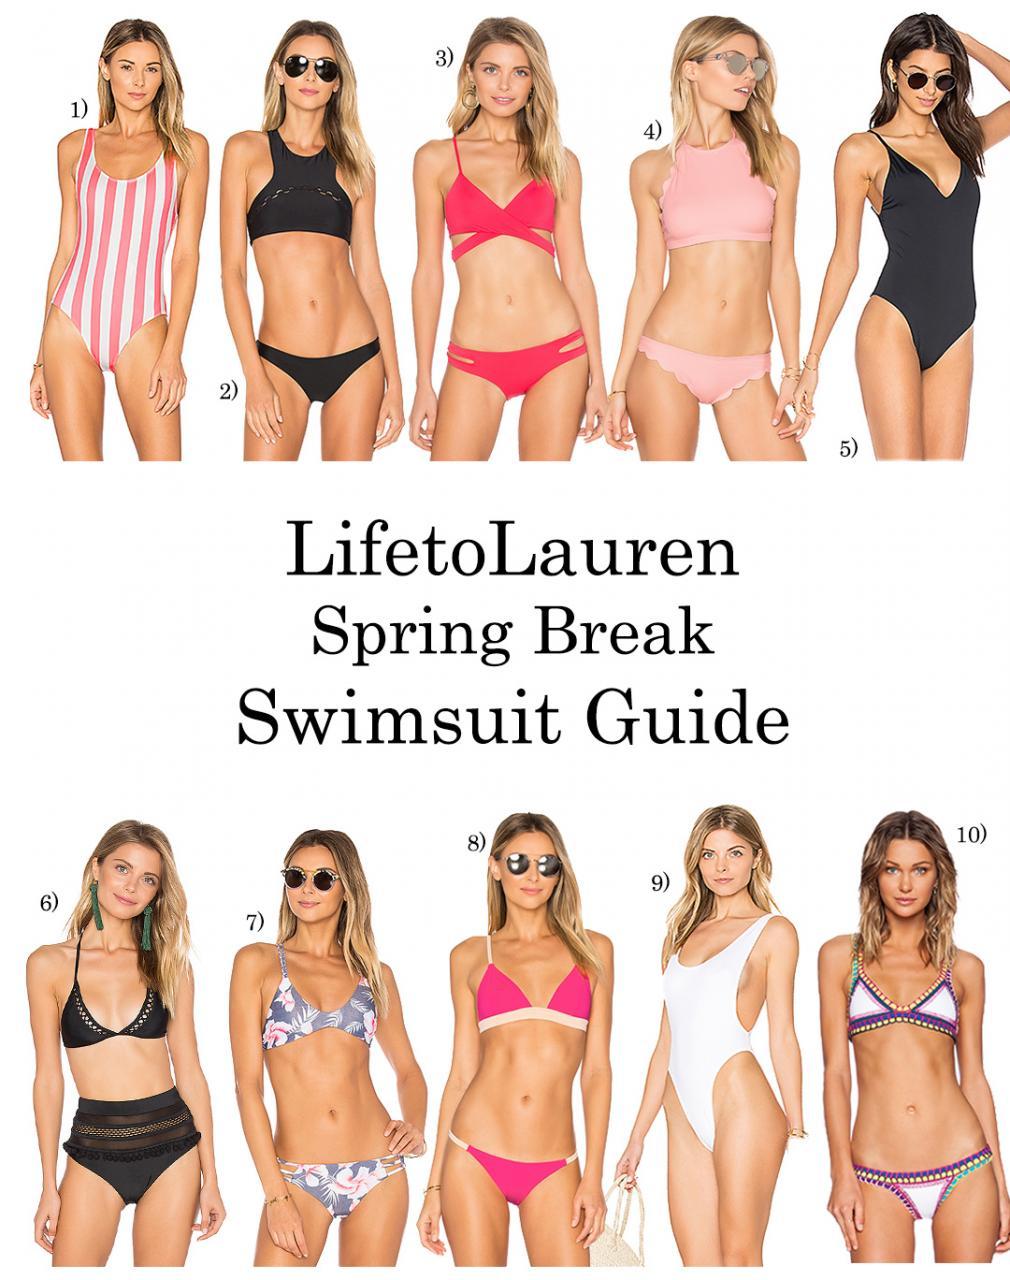 lifetolauren-spring-break-swimsuit